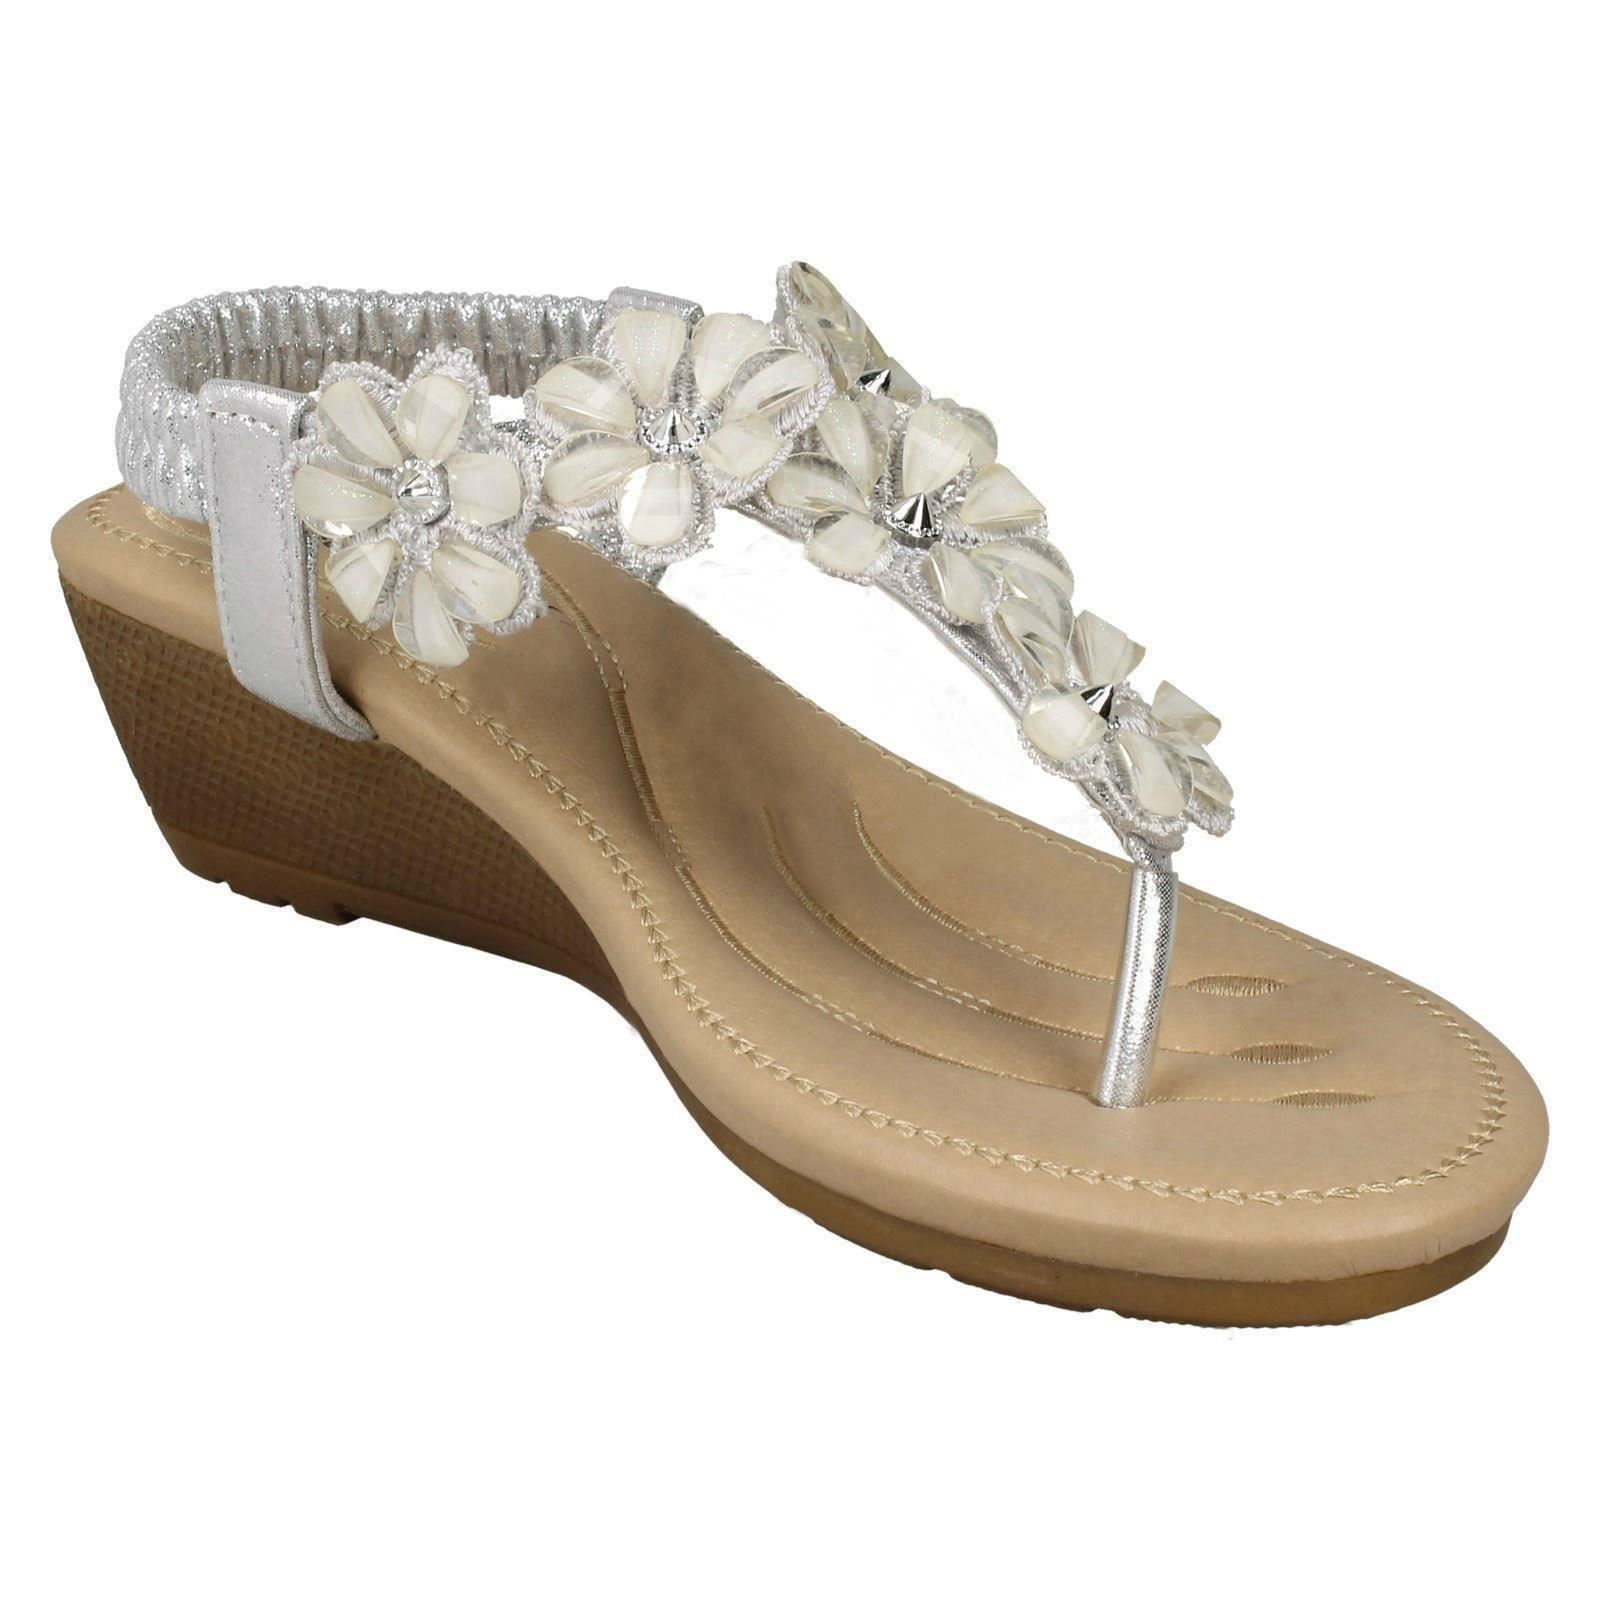 Ladies Savannah Sandals Mid Wedge Toepost